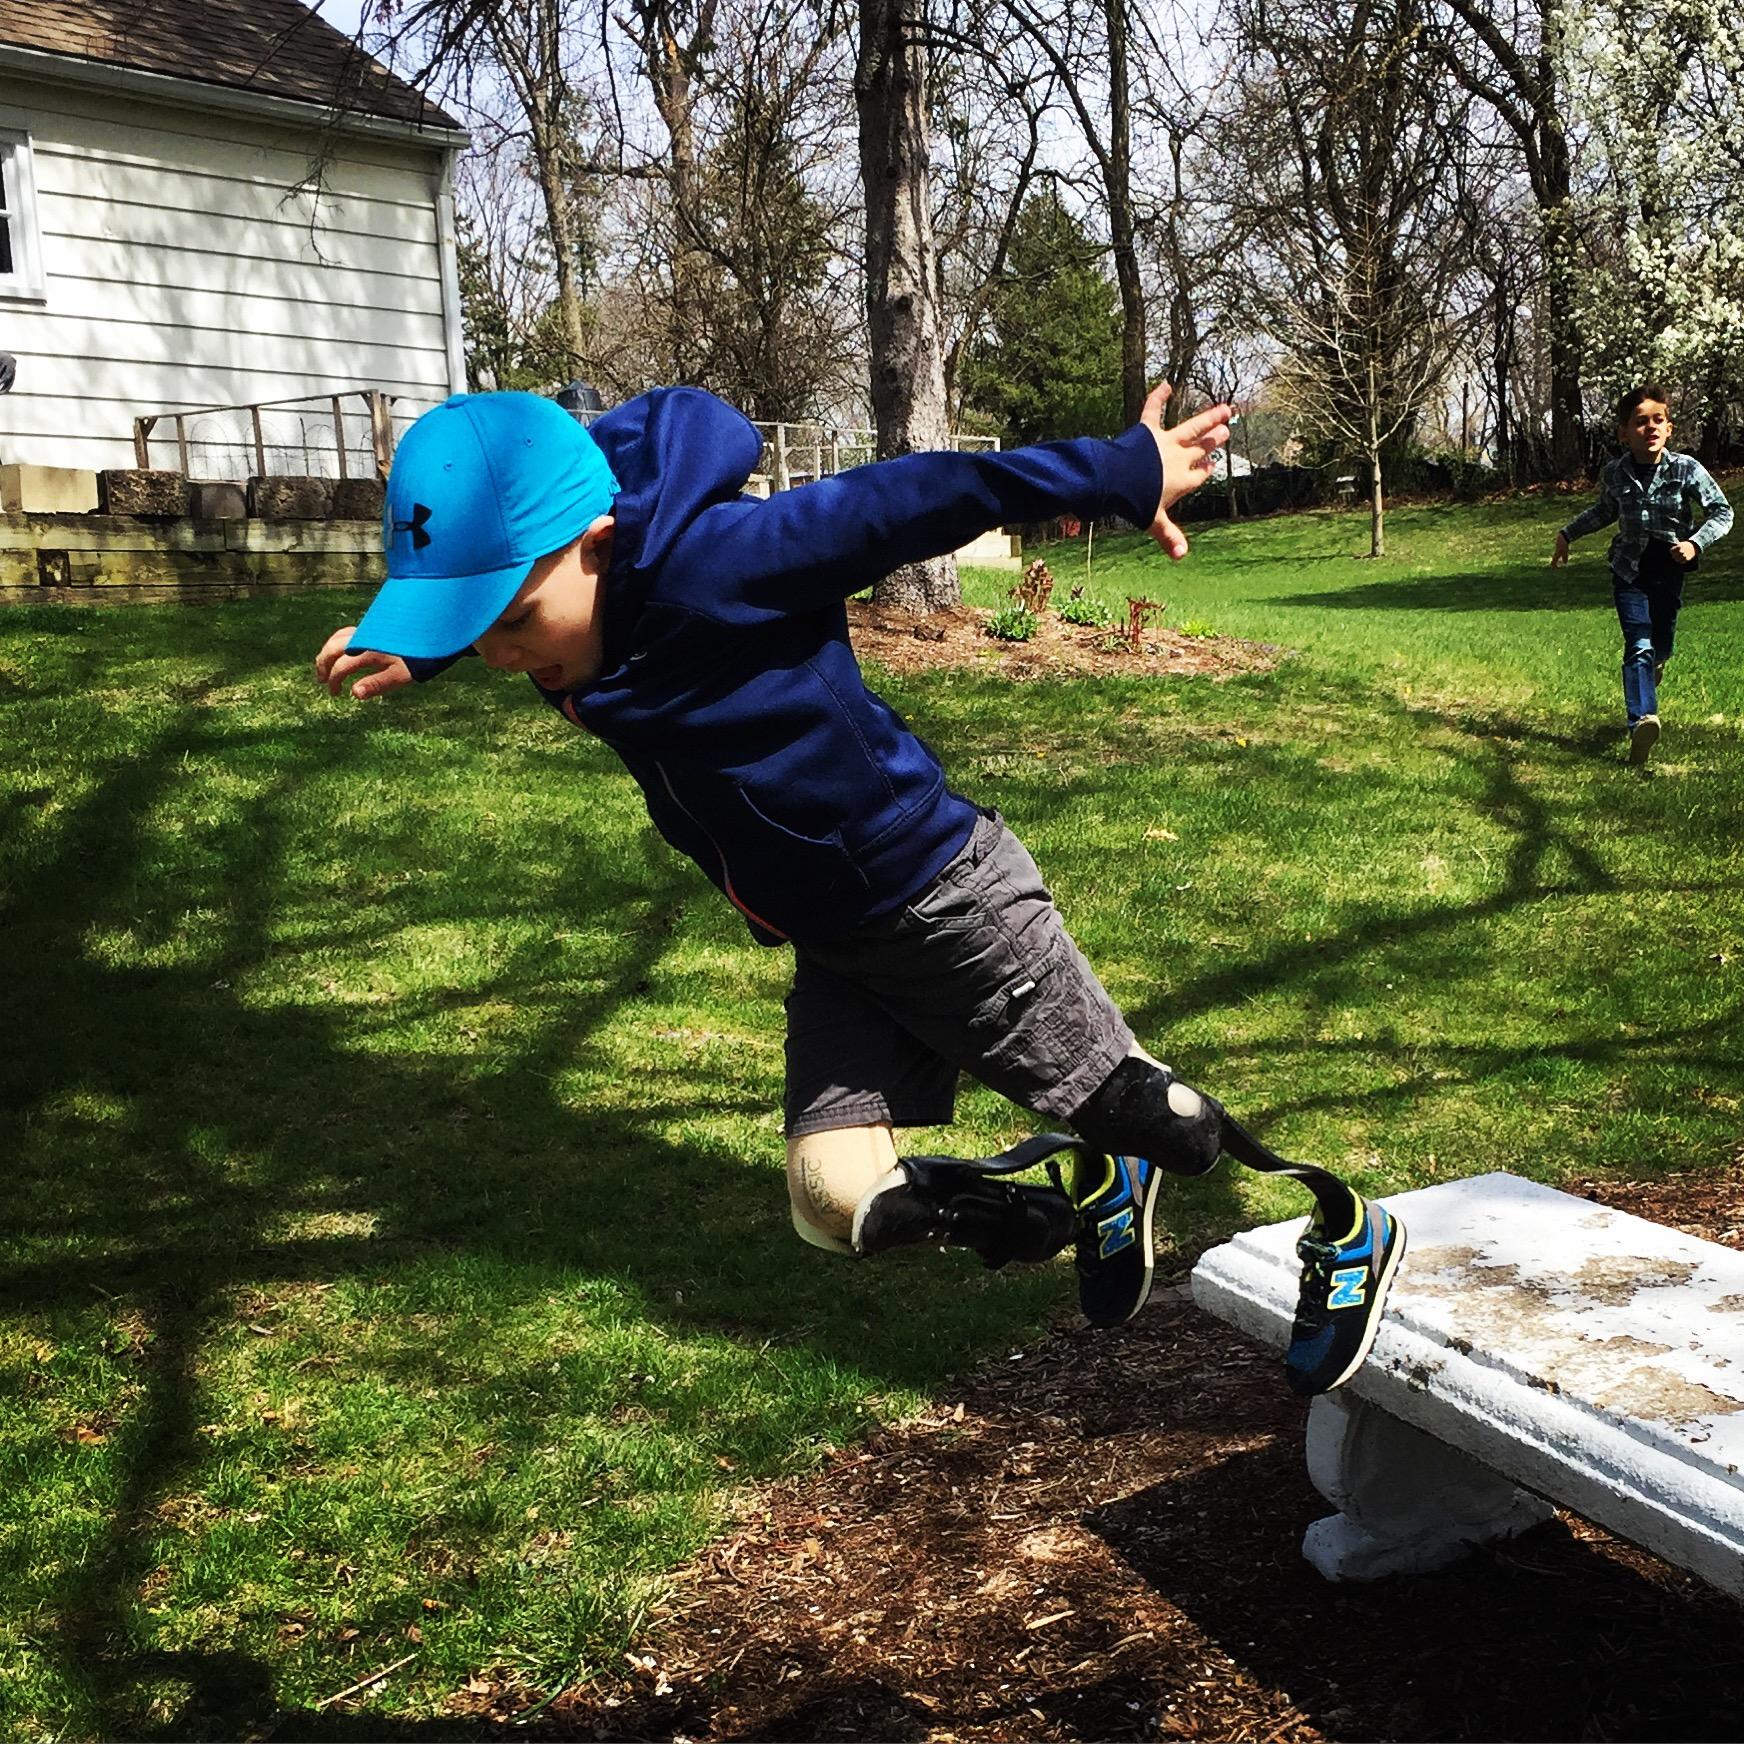 Jude jumping